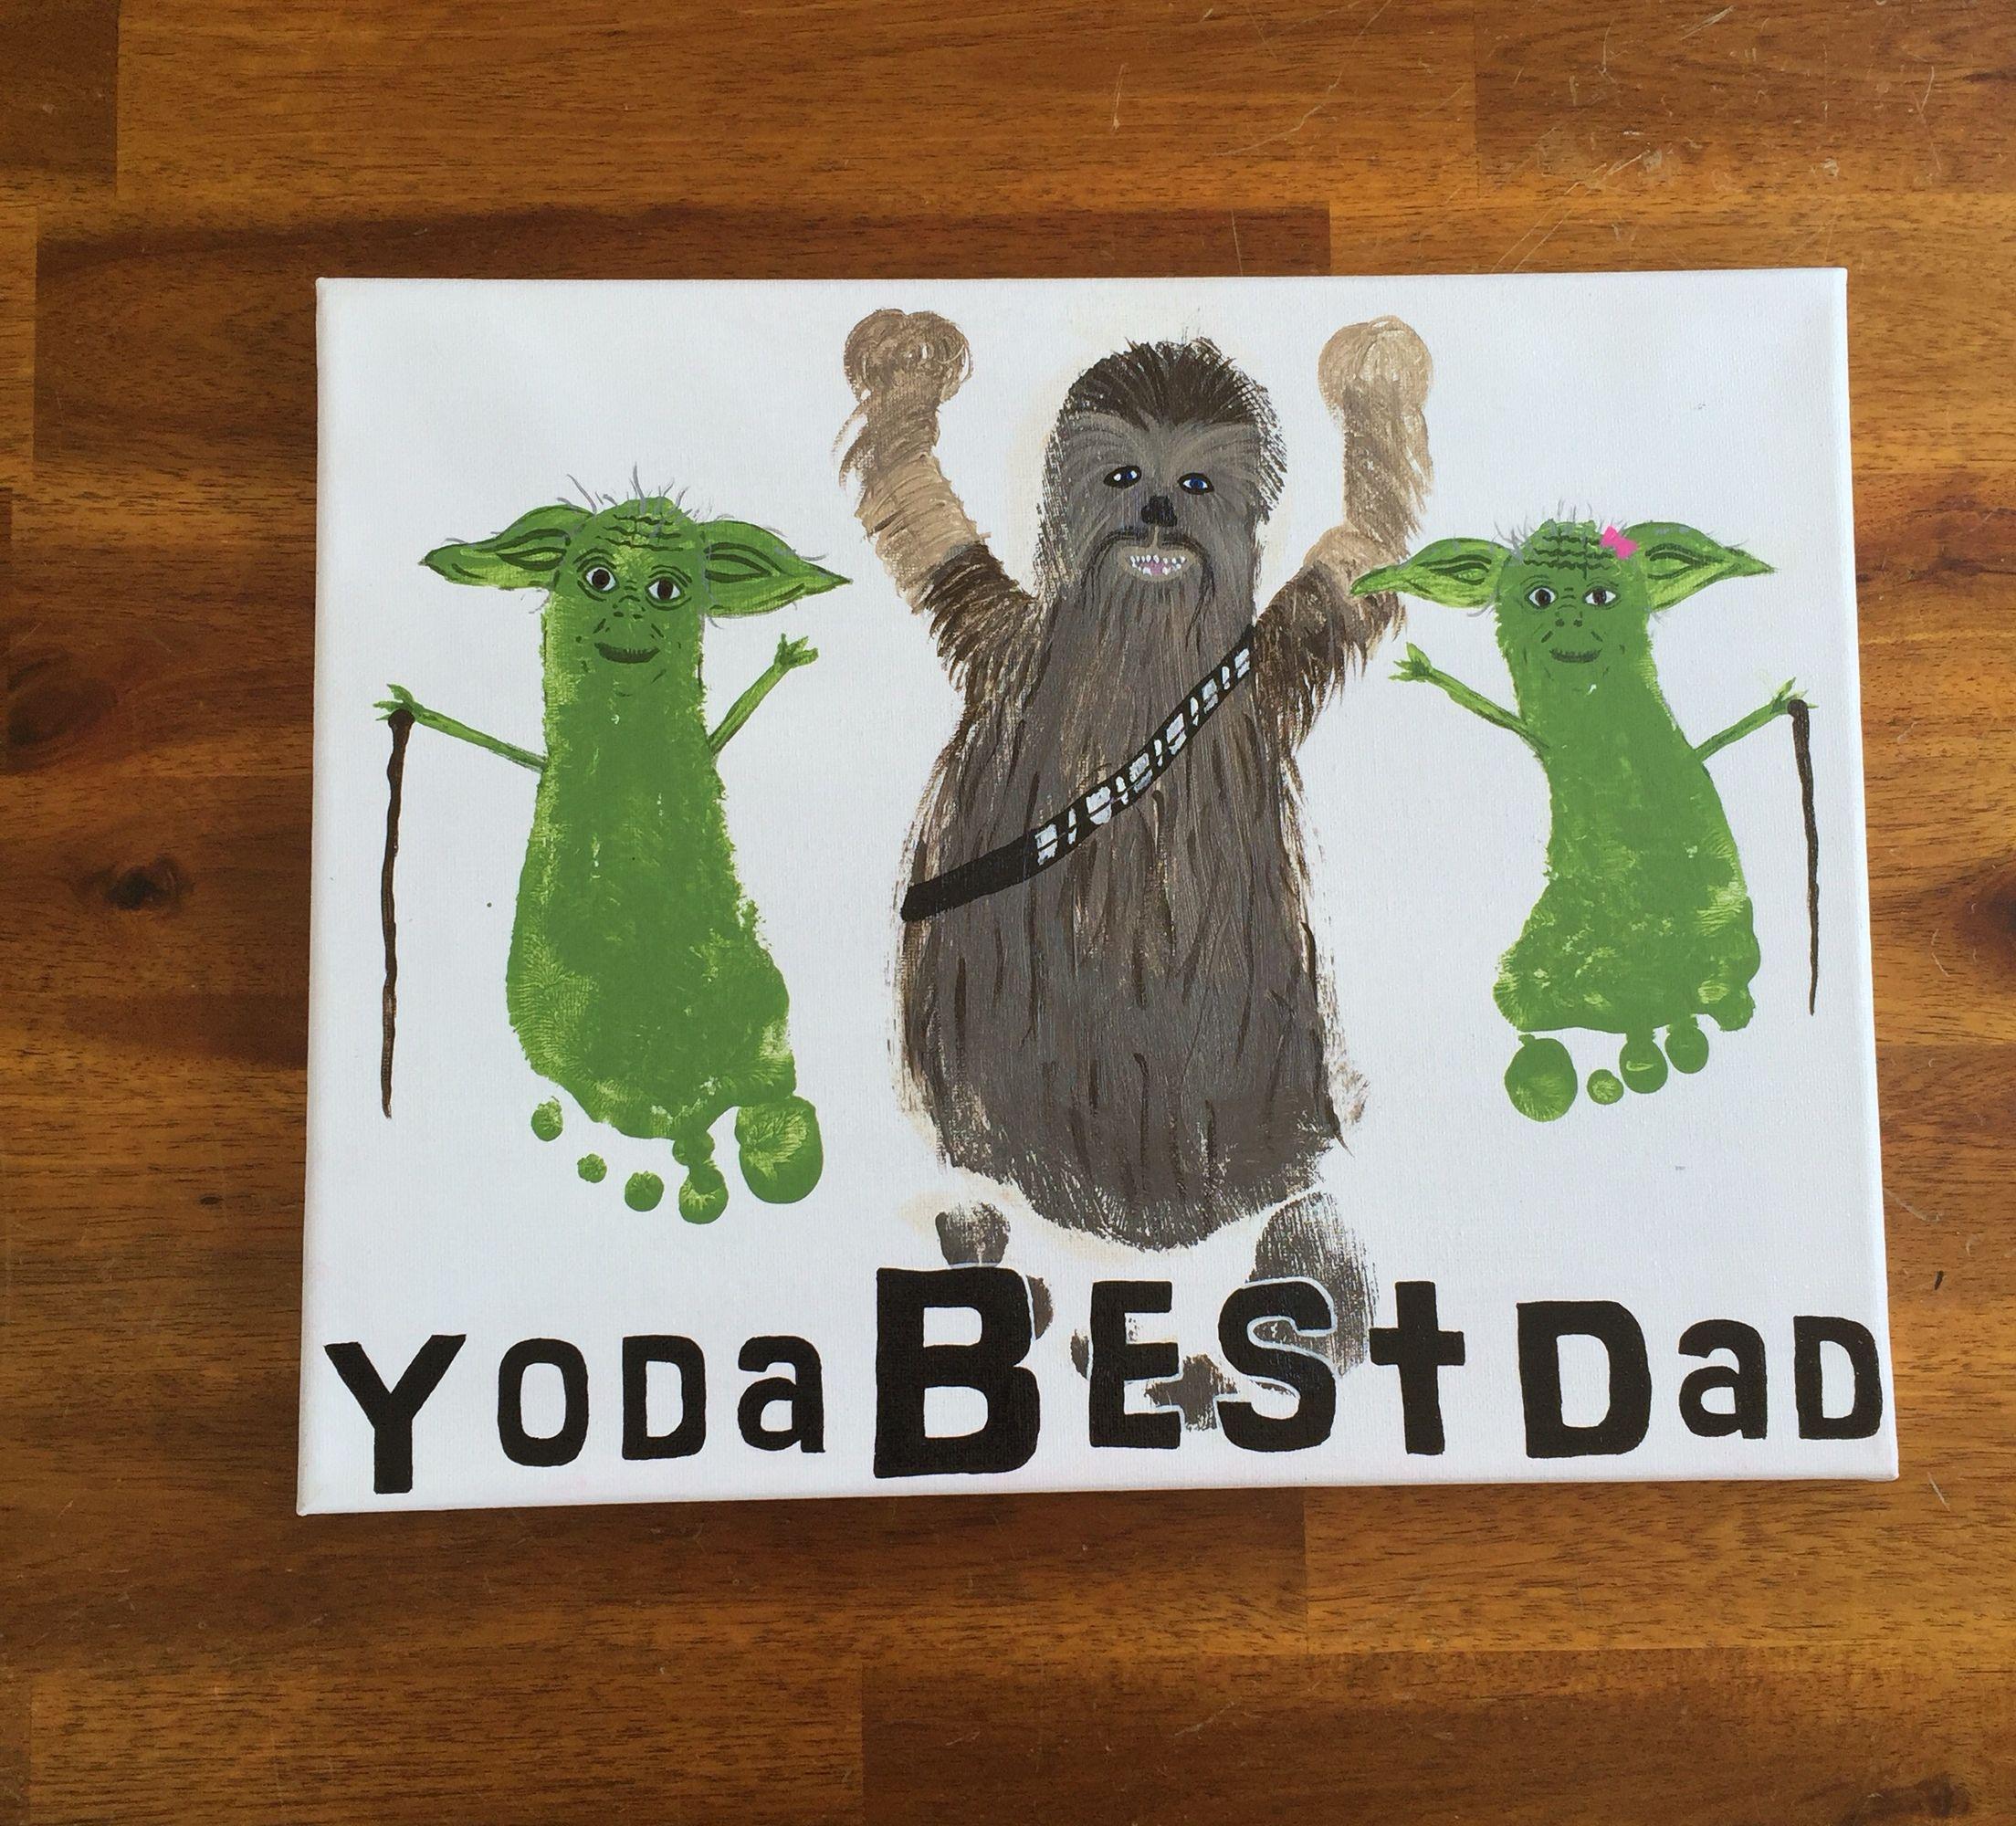 Yoda Best Dad Footprint Fathers Day Gift Idea Acrylic On